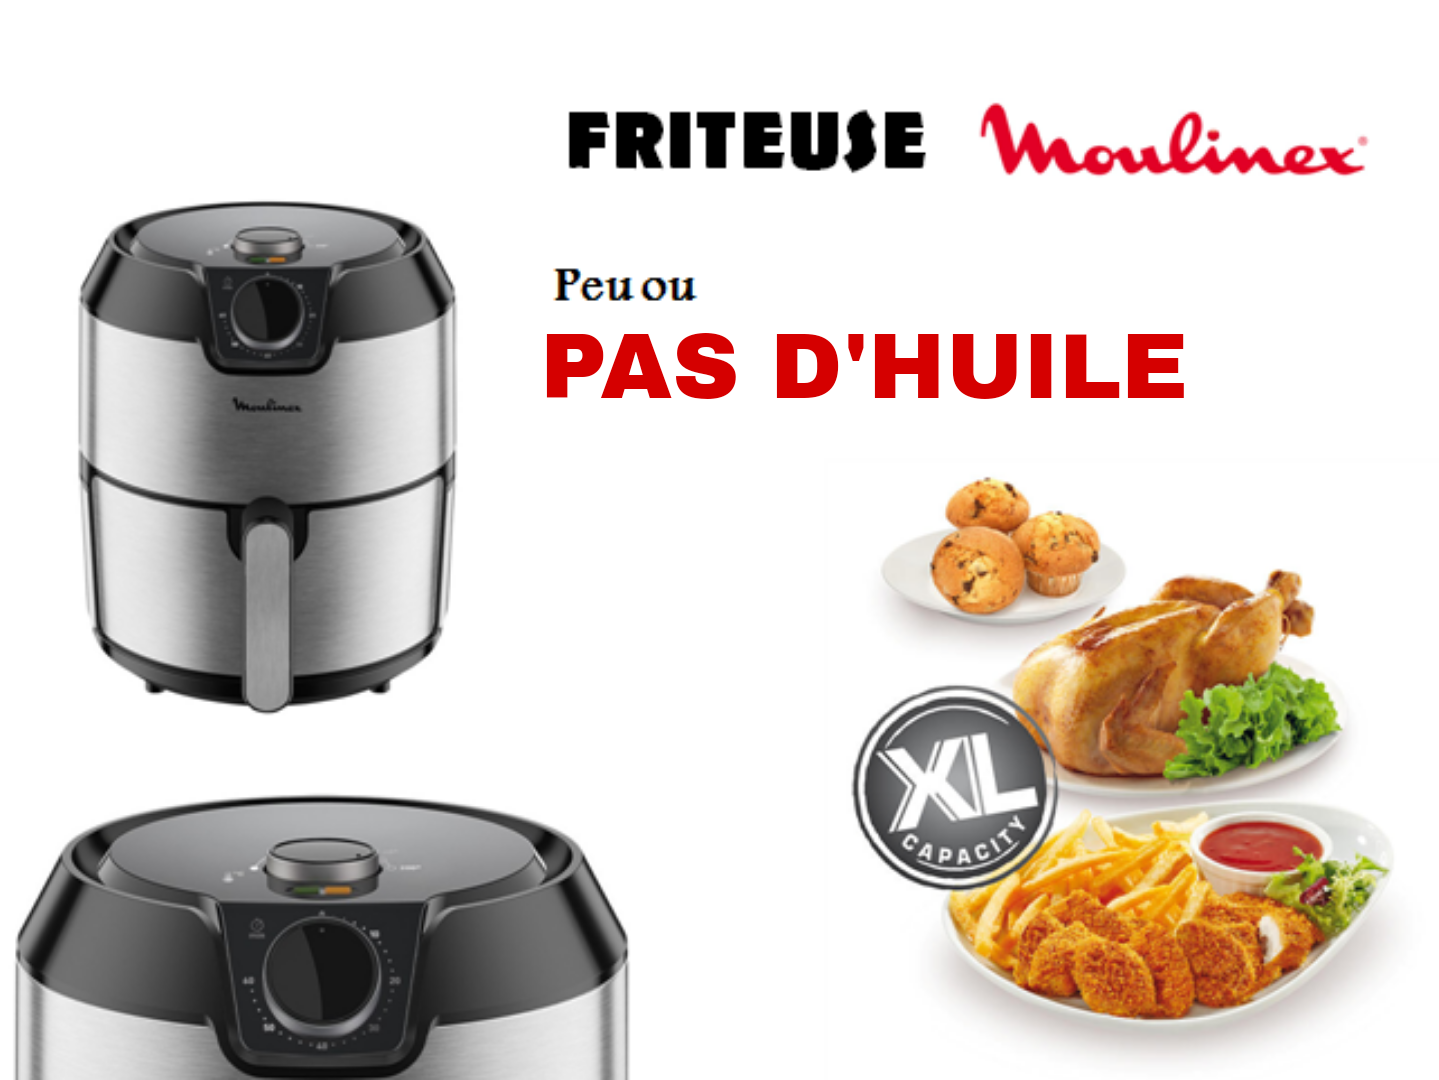 Friteuse Moulinex 4.2L